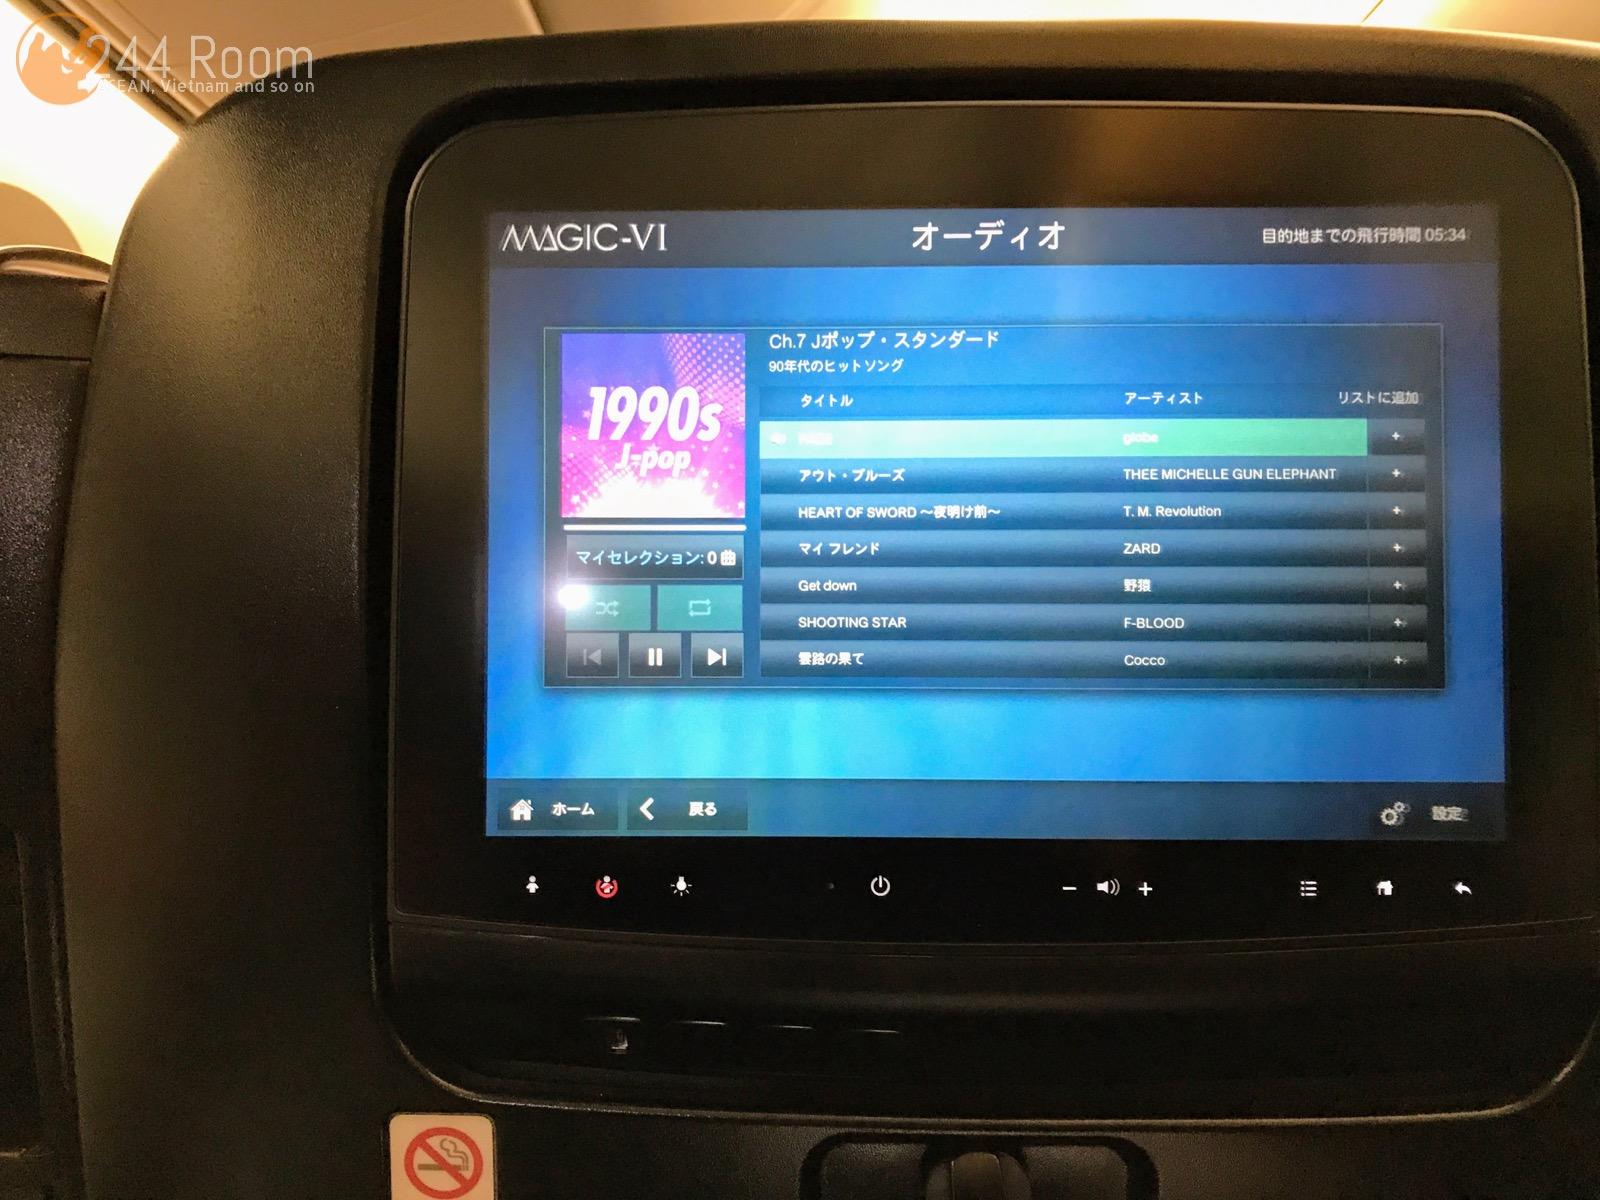 JALプレミアムエコノミークラス座席 JAL Premium-economyclass-flight-seat3